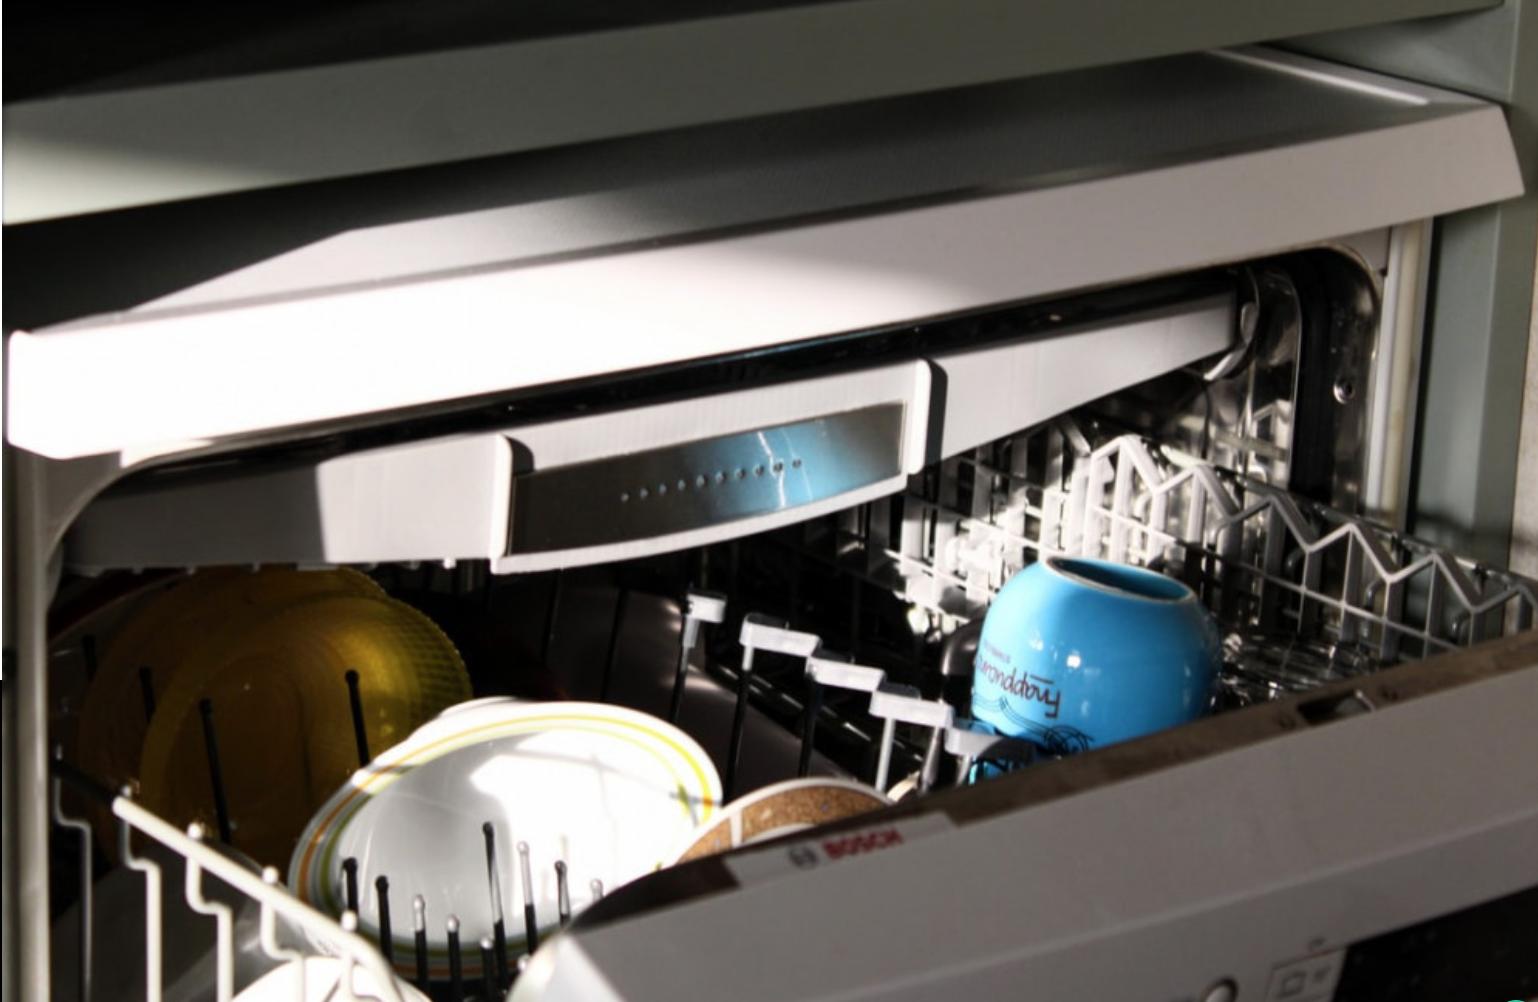 Do Dishwashers Heat the Water? - Open dishwasher